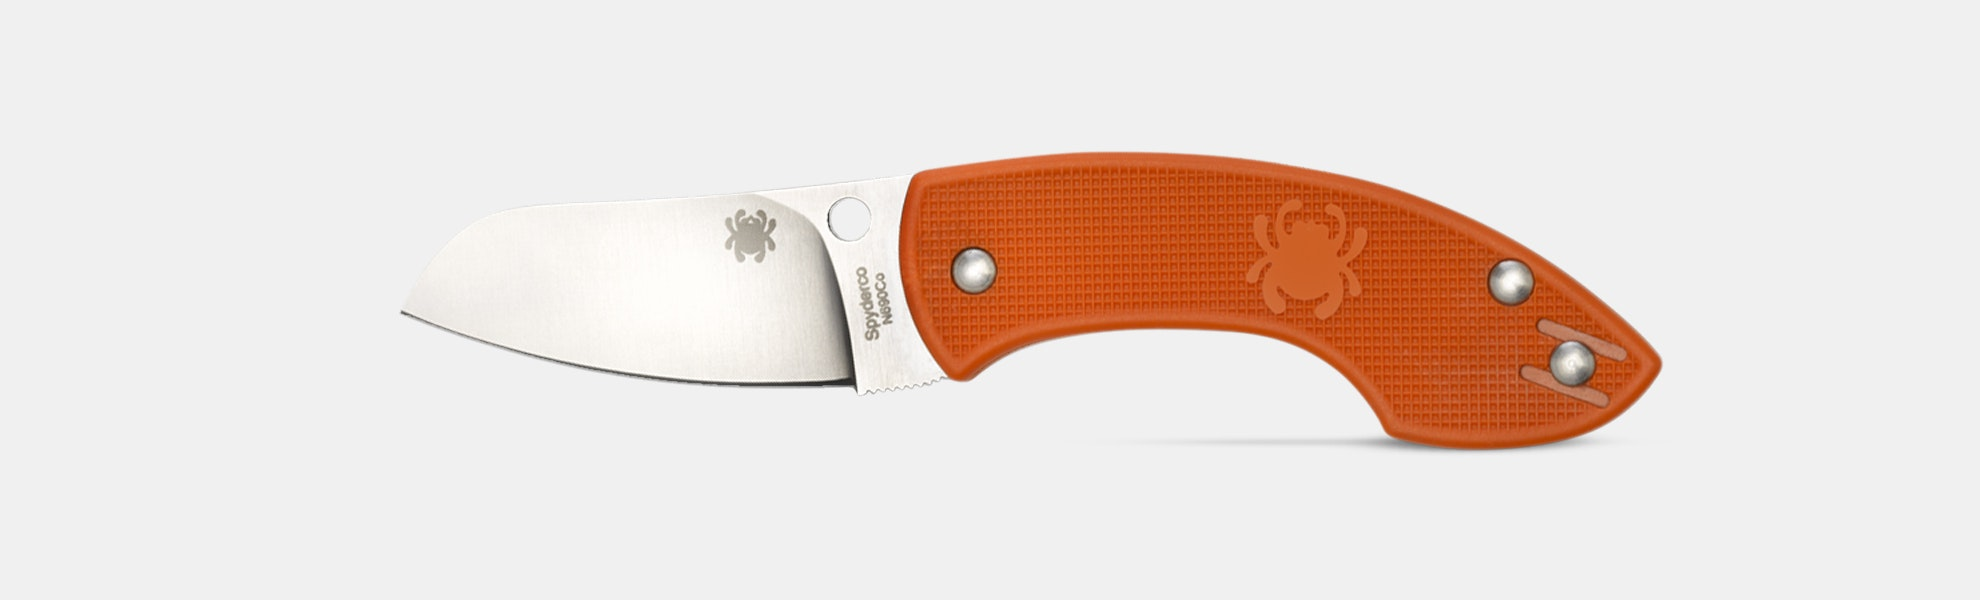 Spyderco Pingo Orange Folding Knife